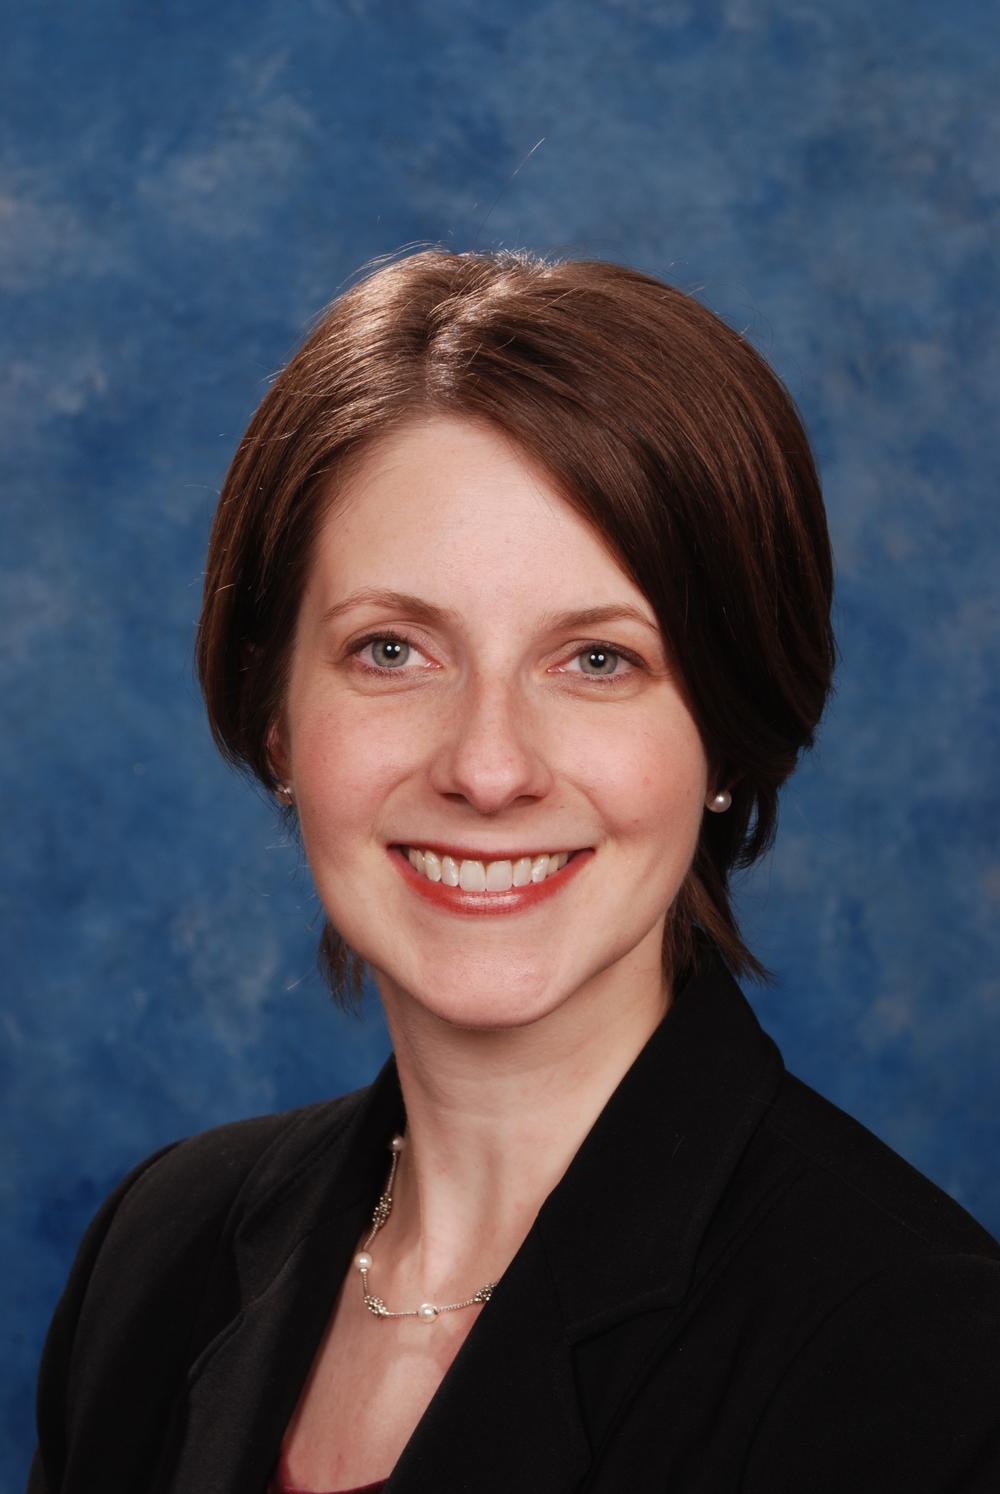 Katherine L. Muller, Psy.D., ABPP